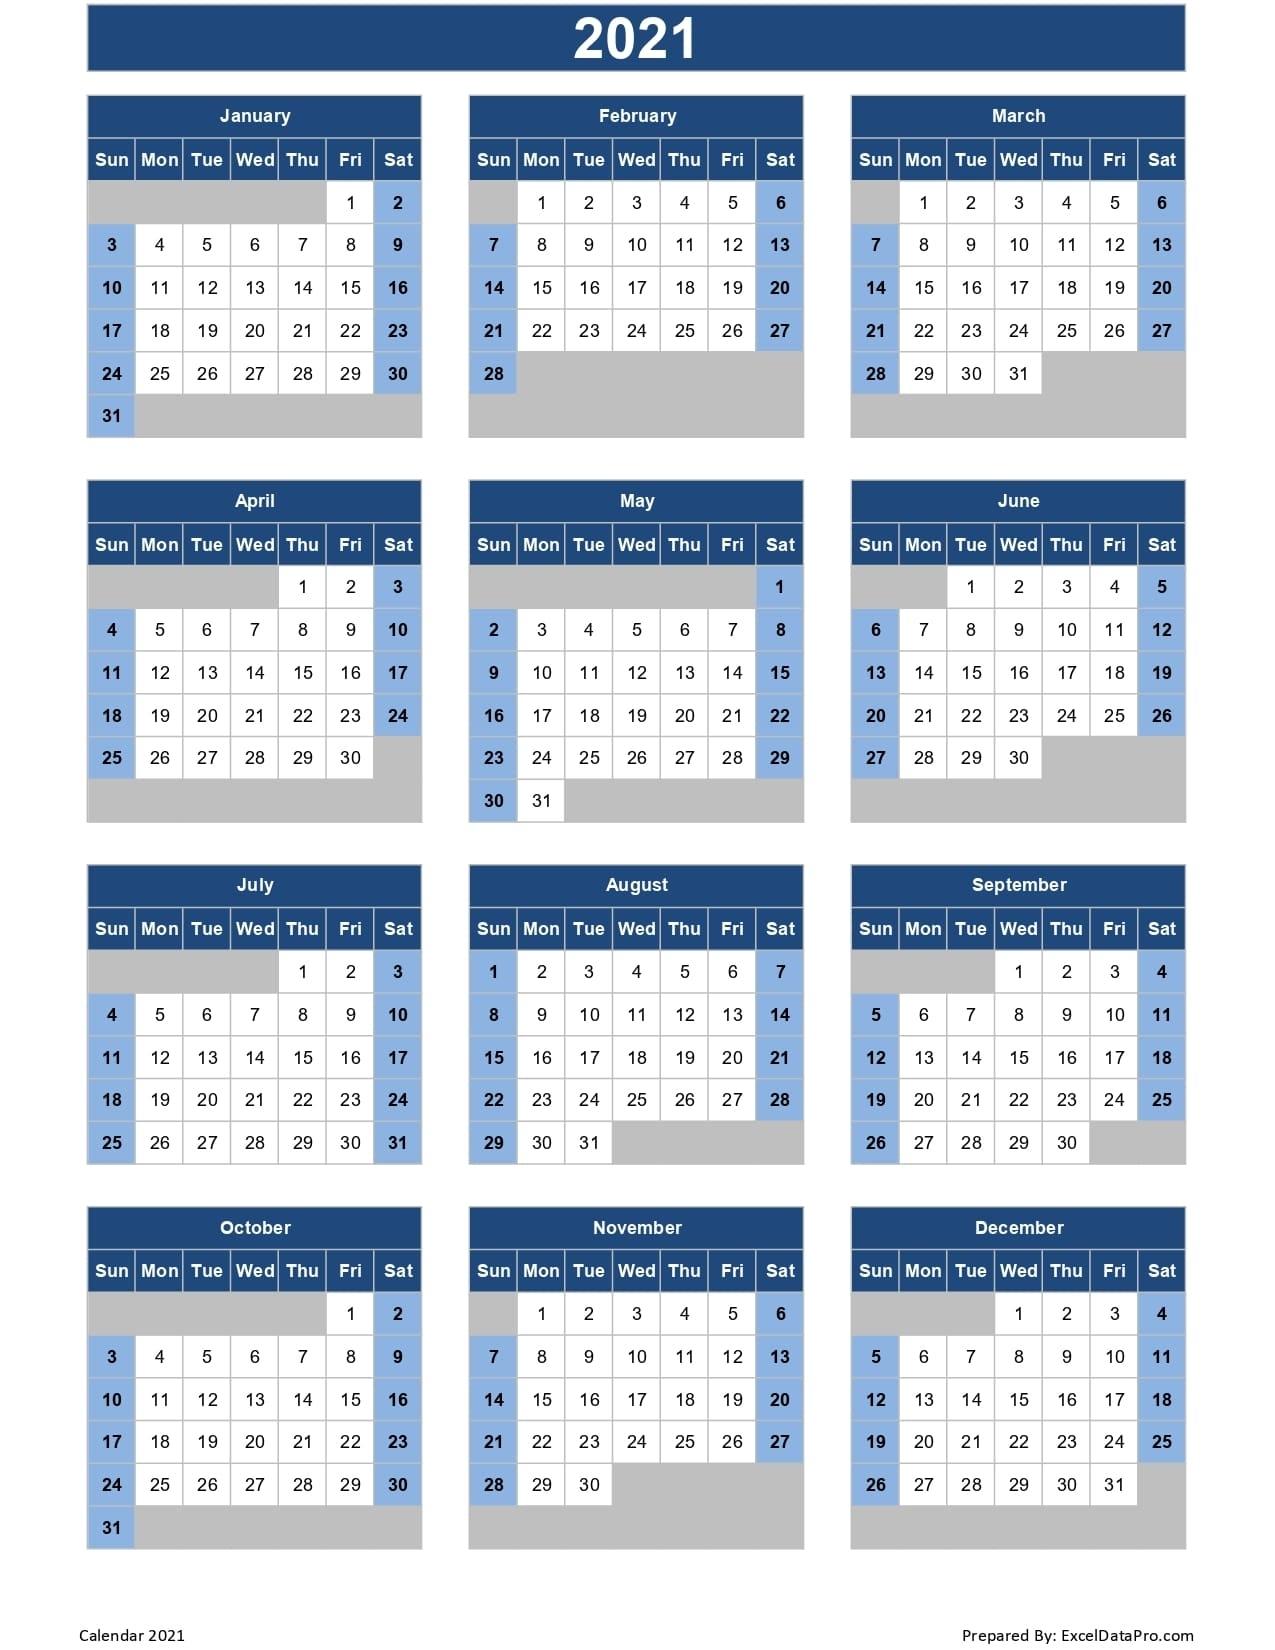 Calendar 2021 Excel Templates, Printable Pdfs & Images - Exceldatapro